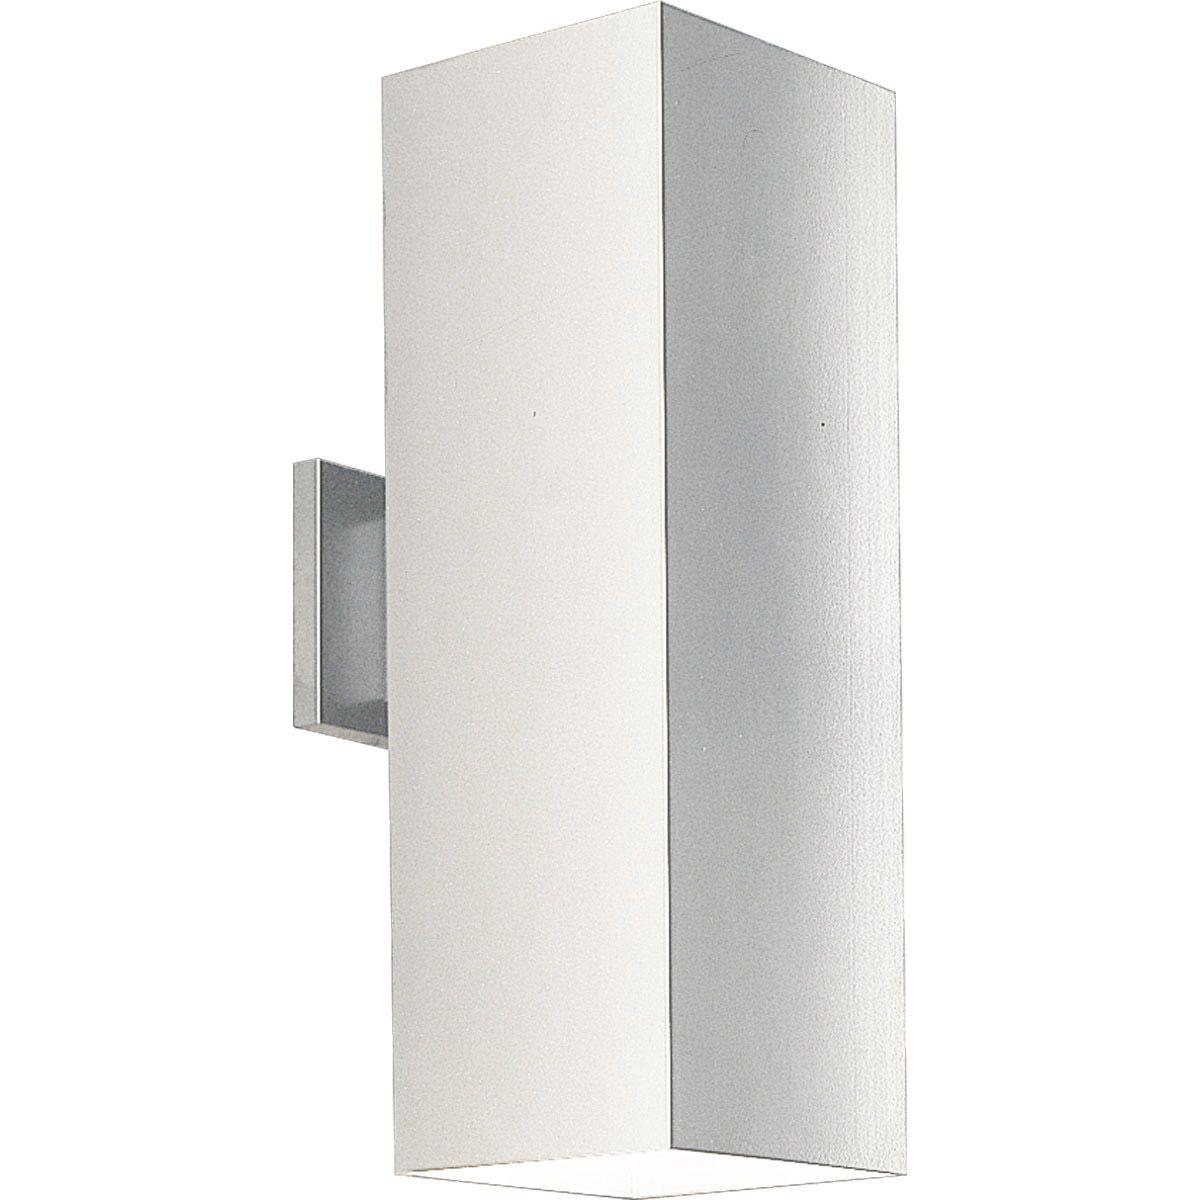 exterior wall mounted light fixtures | Home > Outdoor Lighting ...